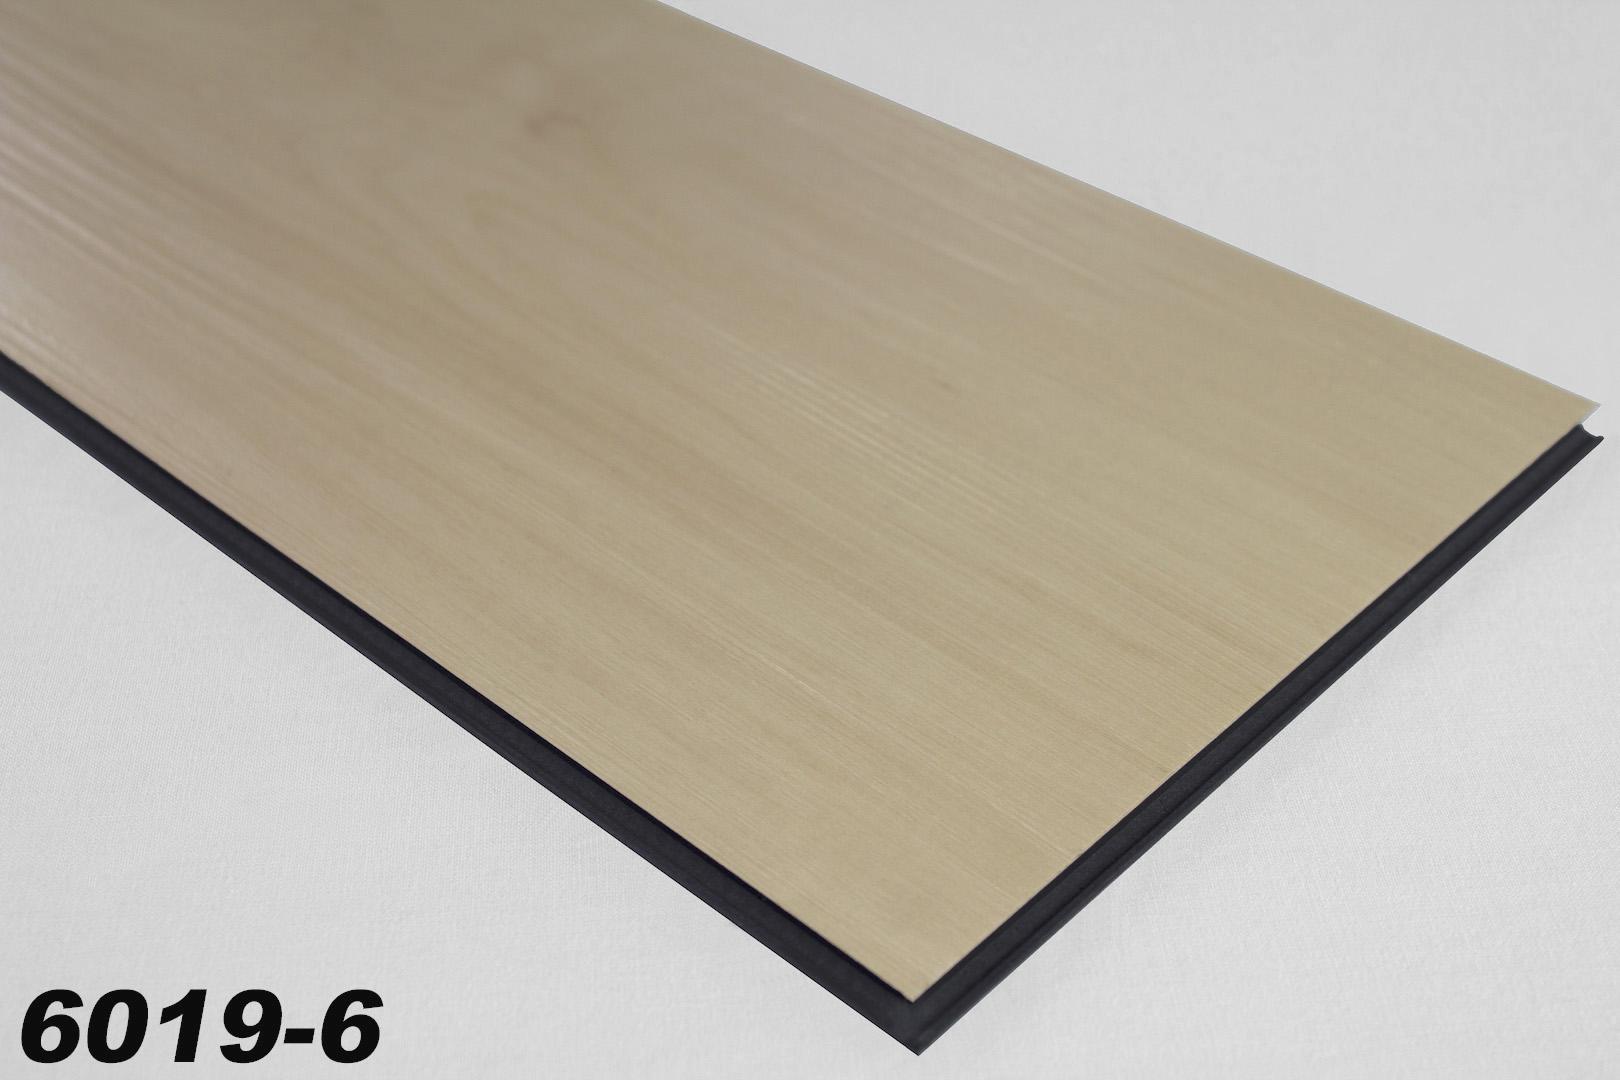 21,2 m² Vinylboden in 4,2mm Uniclic PVC-Bodenbelag Nutzschicht 0,3mm, 6019-6